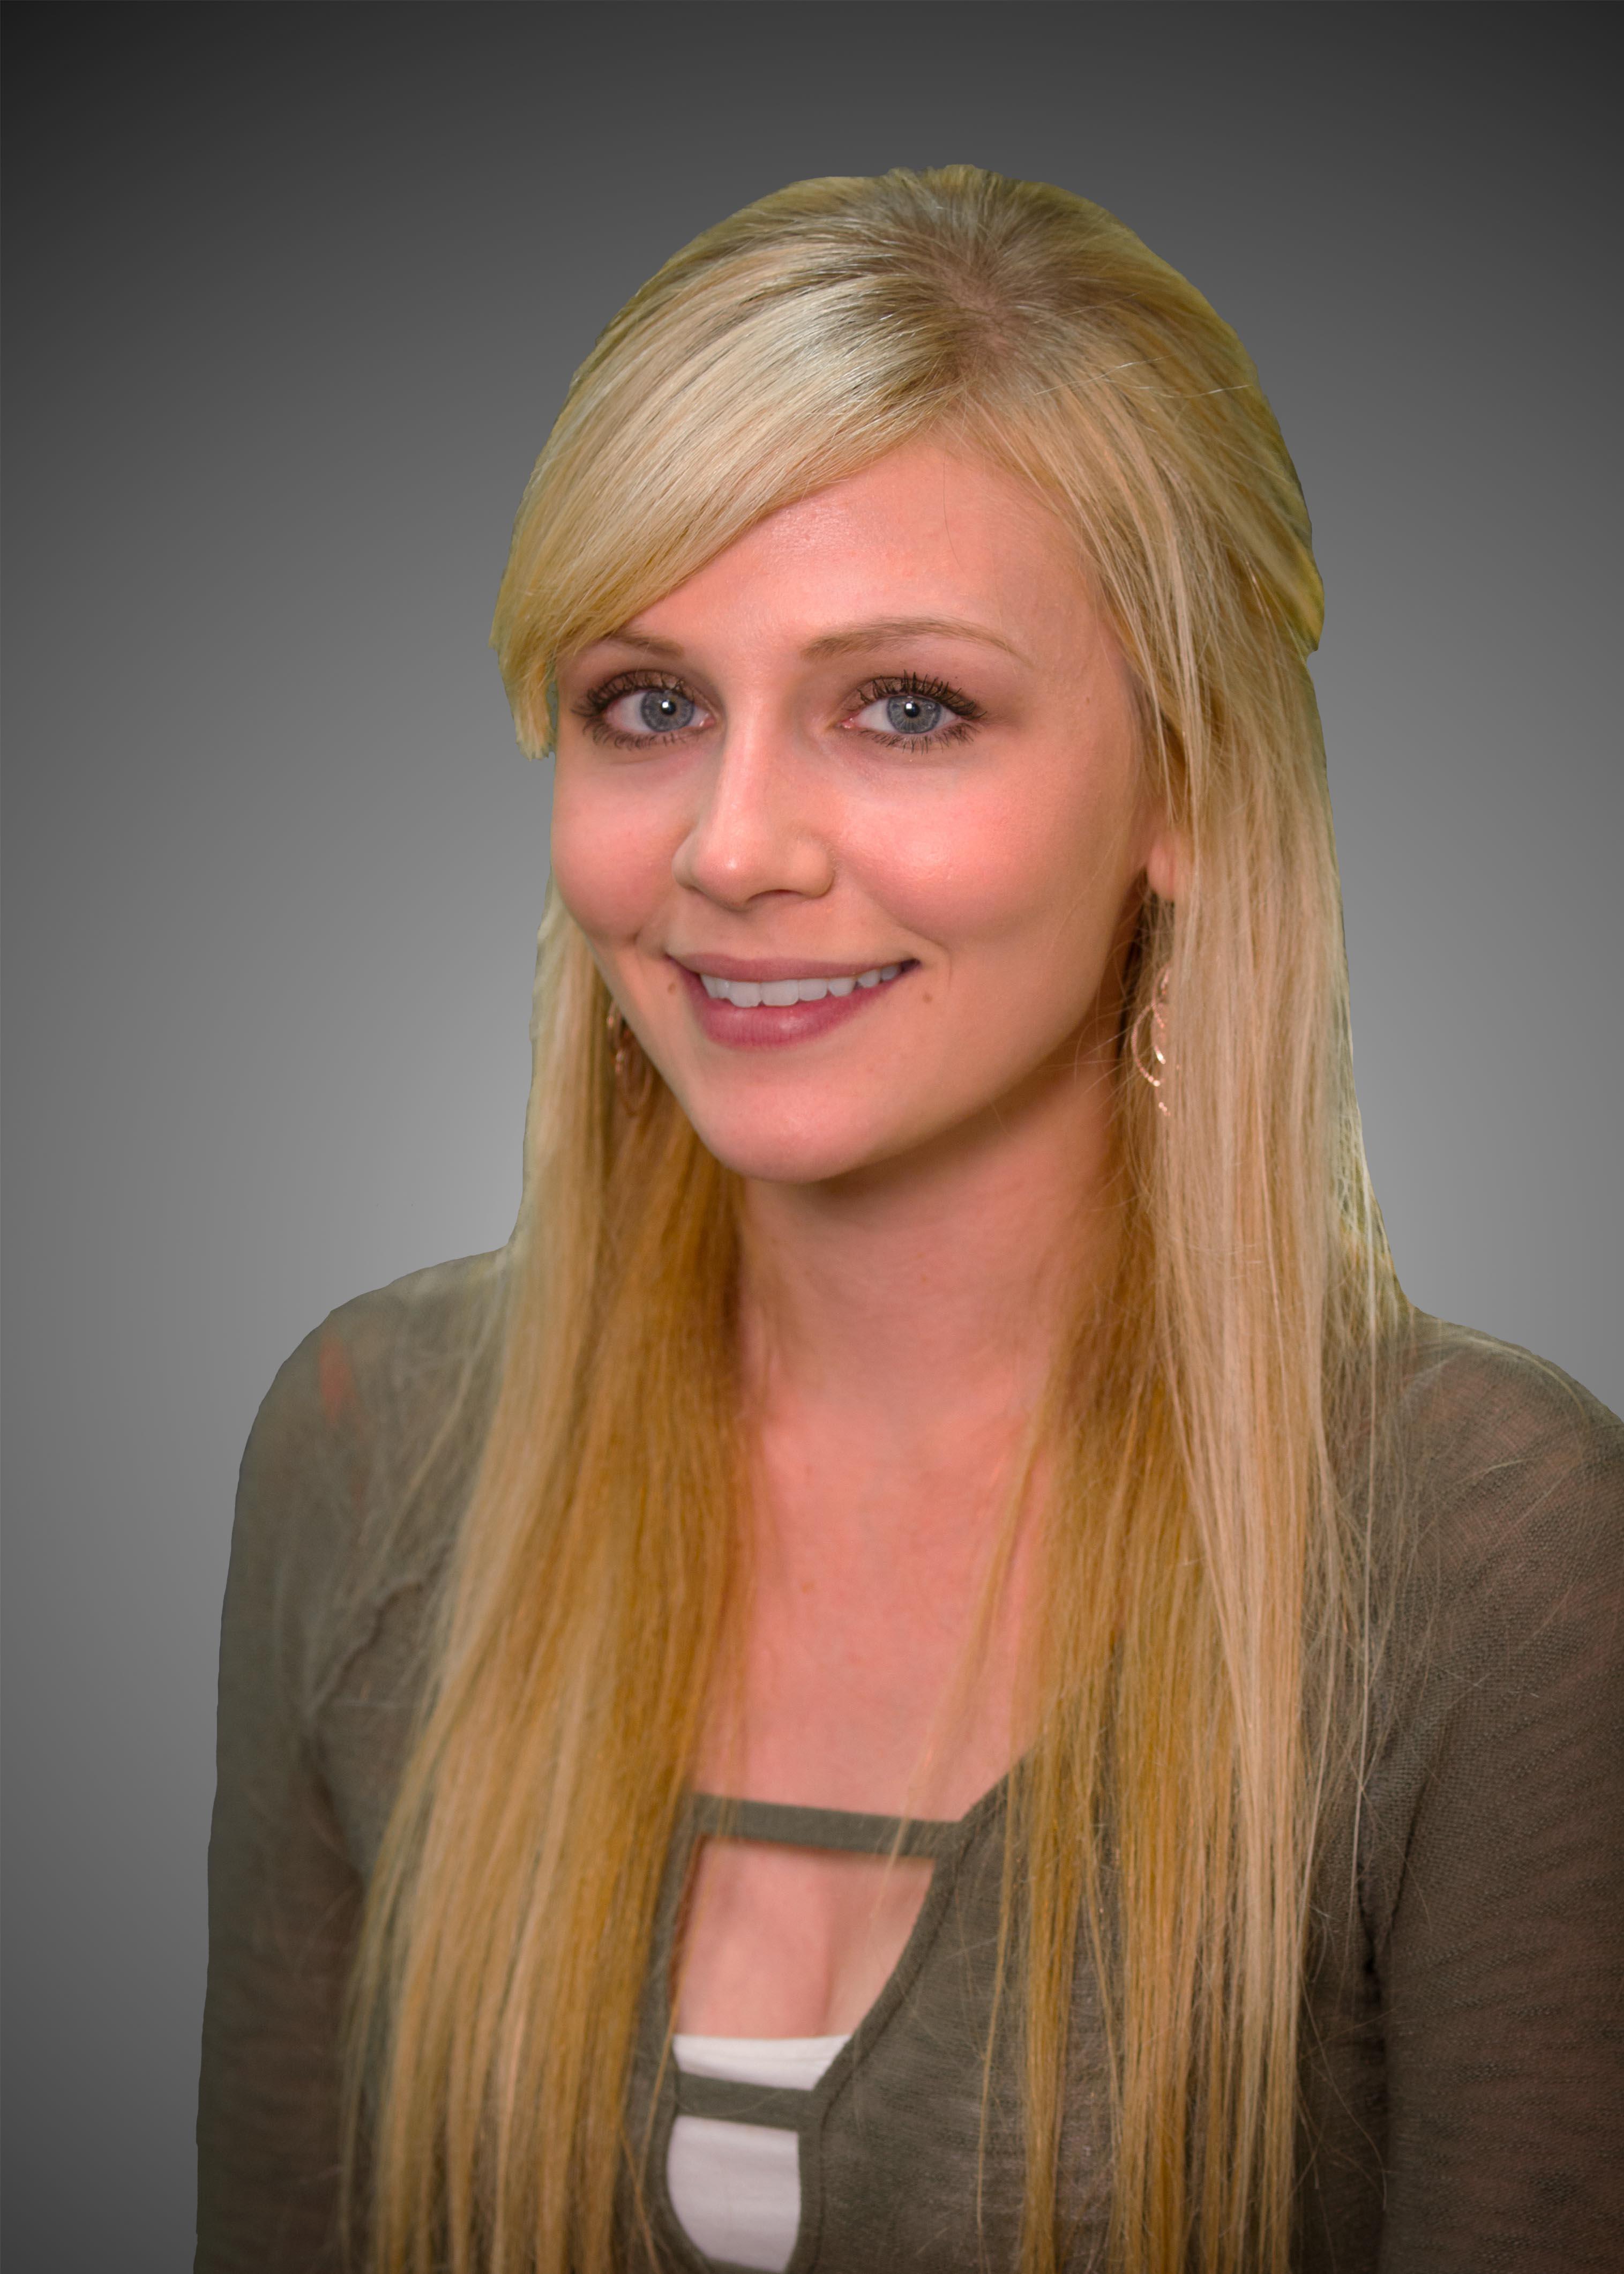 Krista Martin